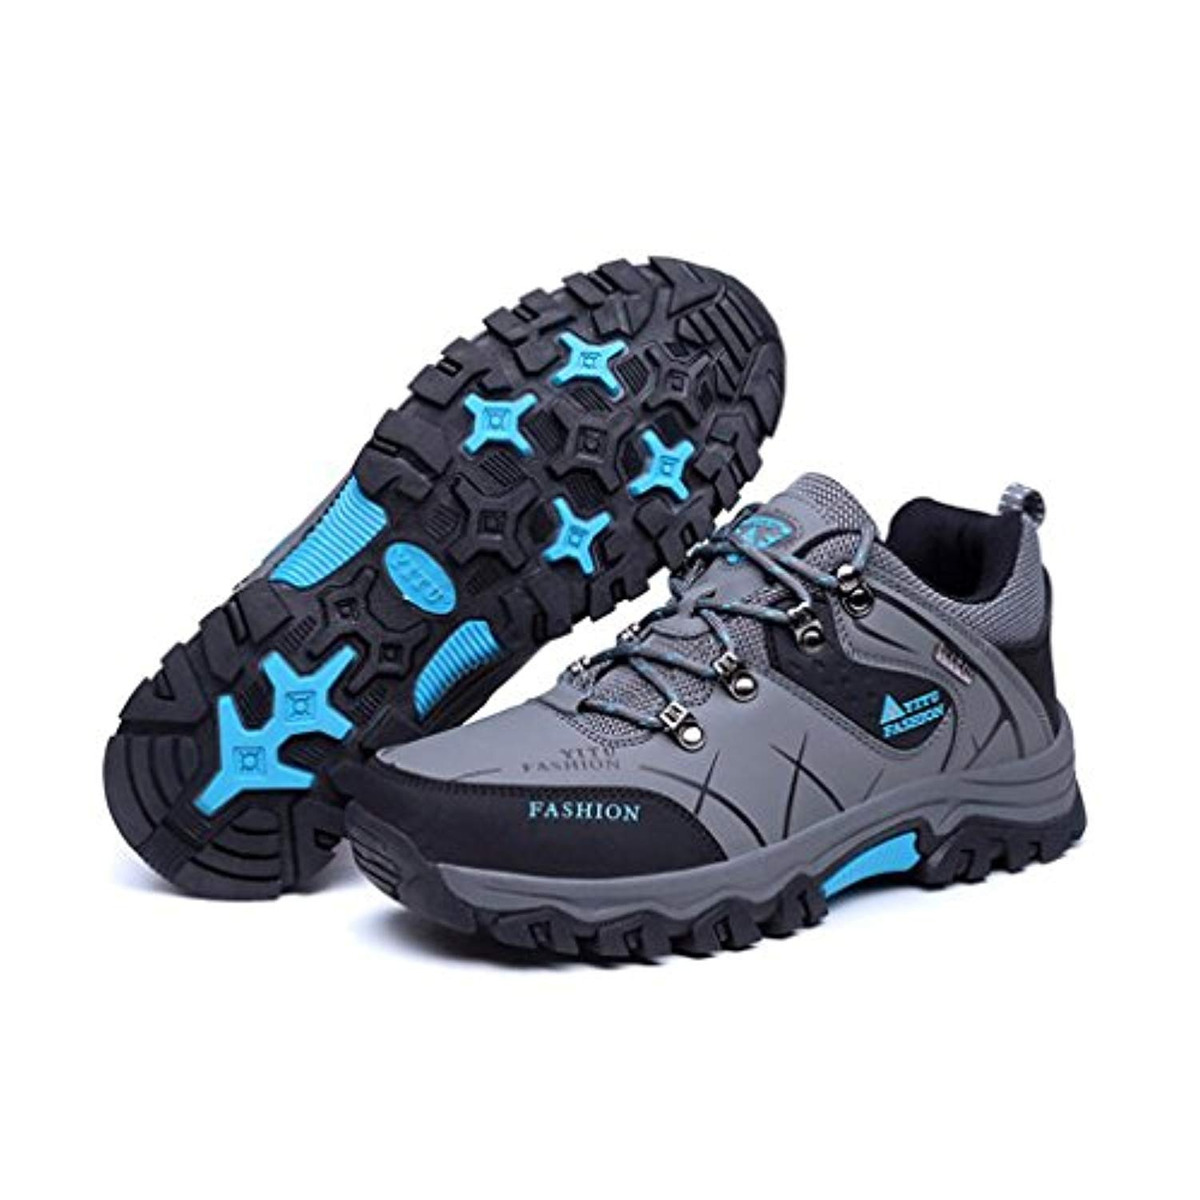 94ee8da23b58 Yaxuan Hiking Shoes,outdoor Sneakers,summer